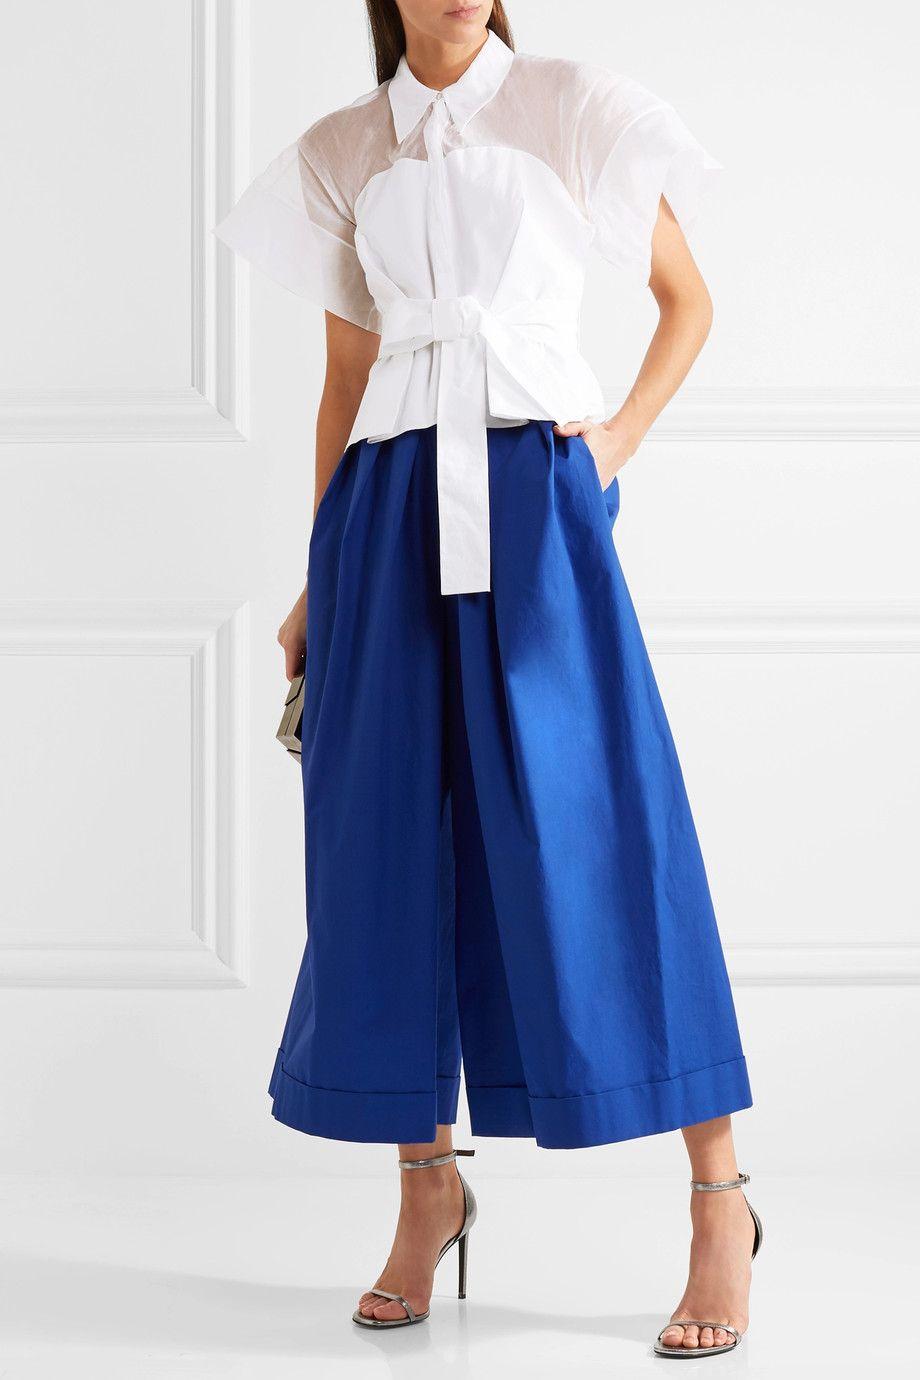 DELPOZO   Cotton-organza and poplin shirt   NET-A-PORTER.COM